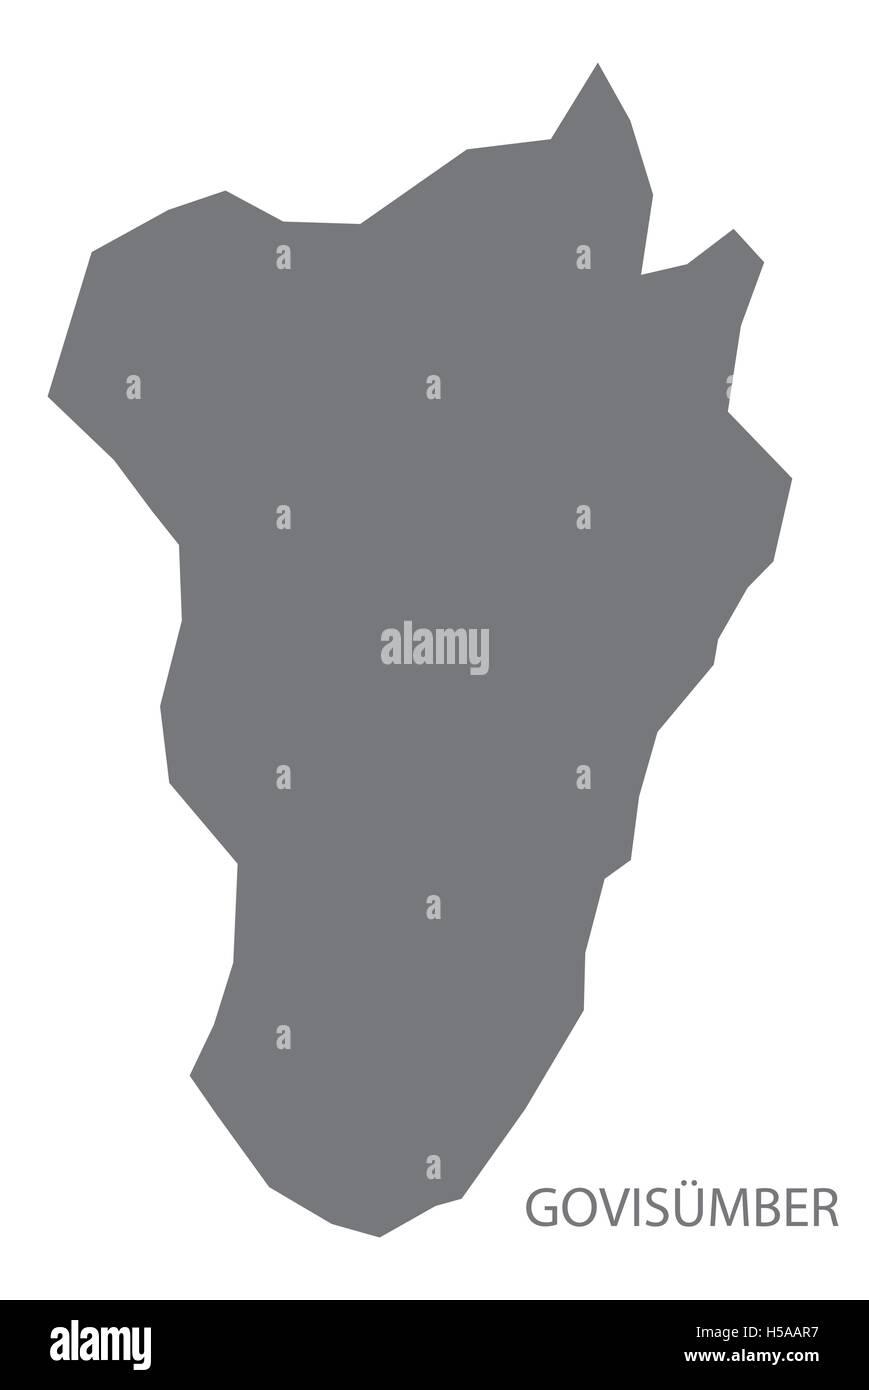 Govisumber Mongolia Map grey - Stock Vector